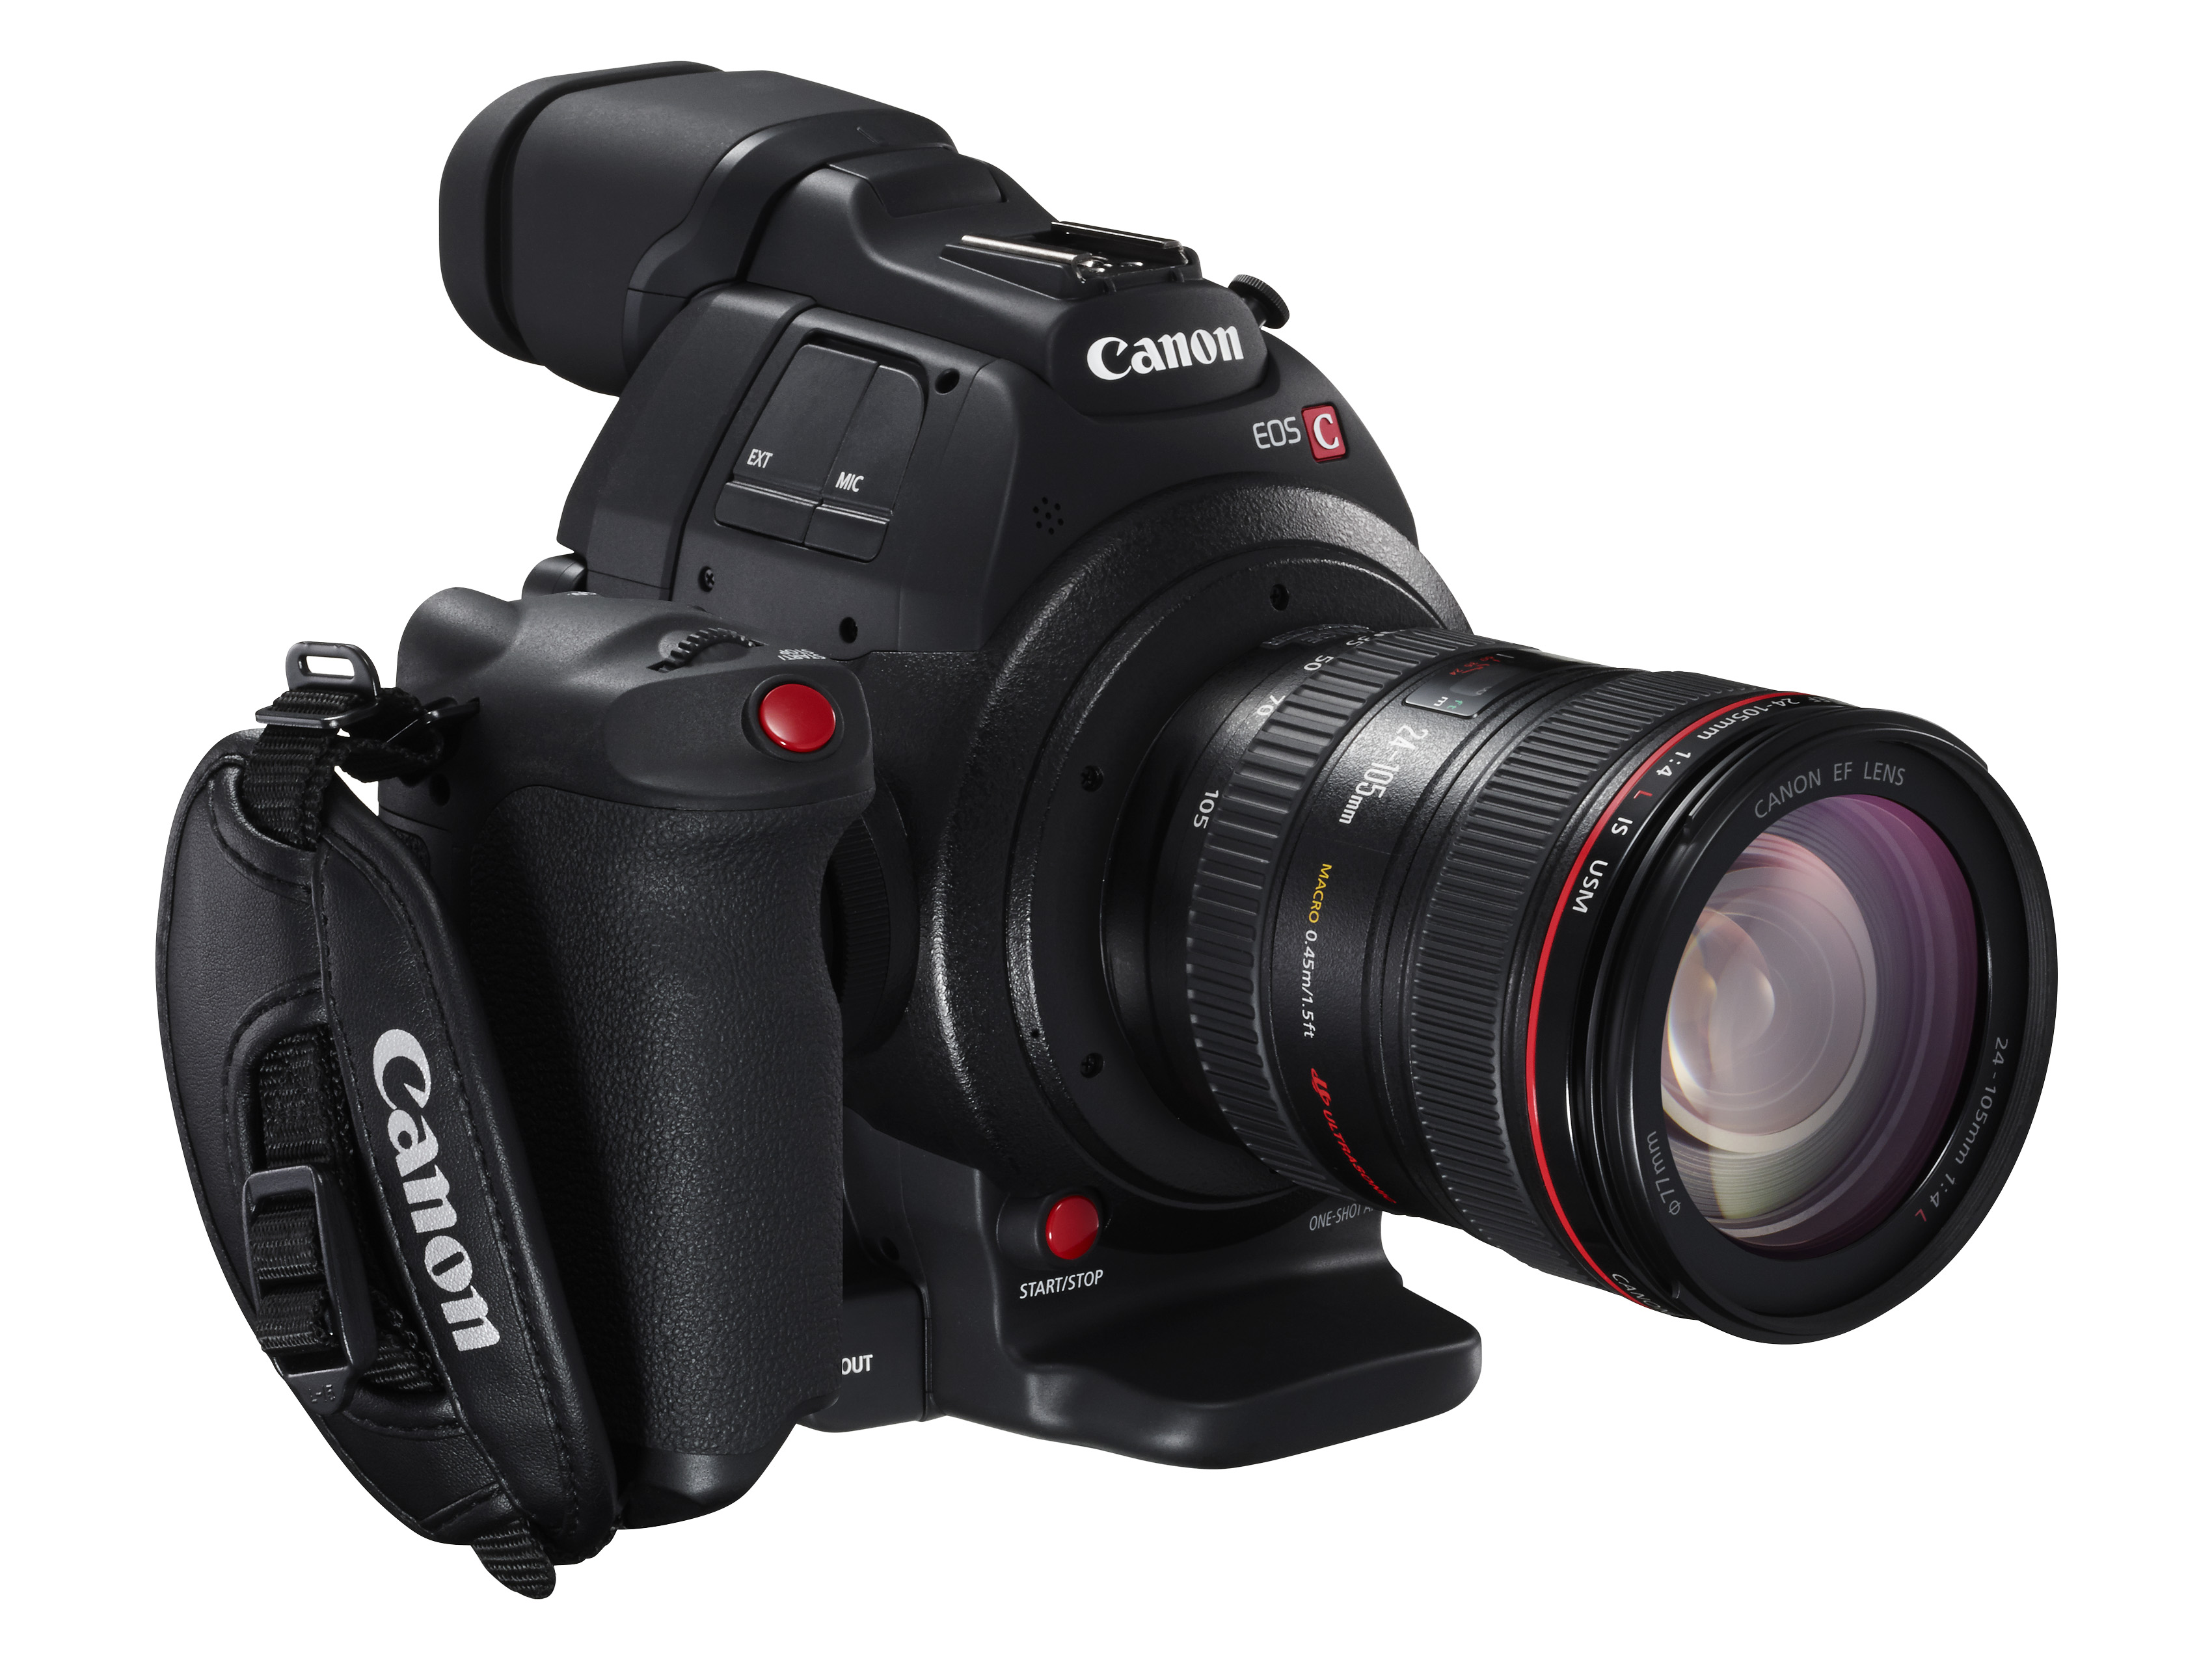 Canon Eos C100 Mark Ii Digital Cinema Camera Lapham